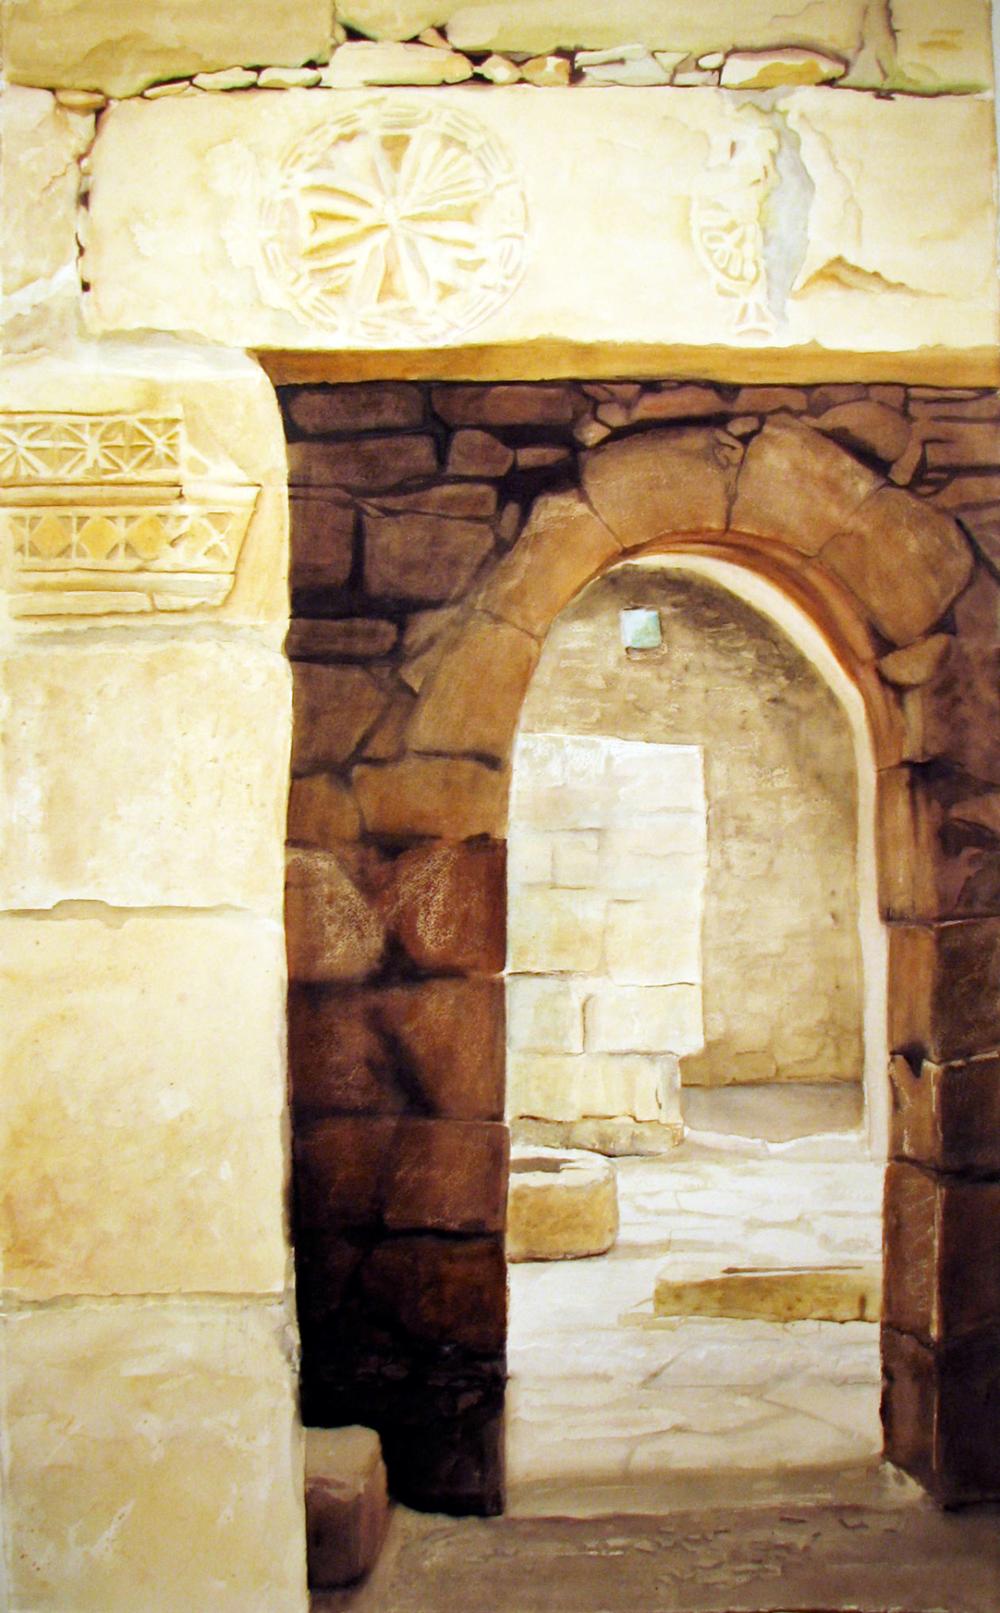 Shivta Archway